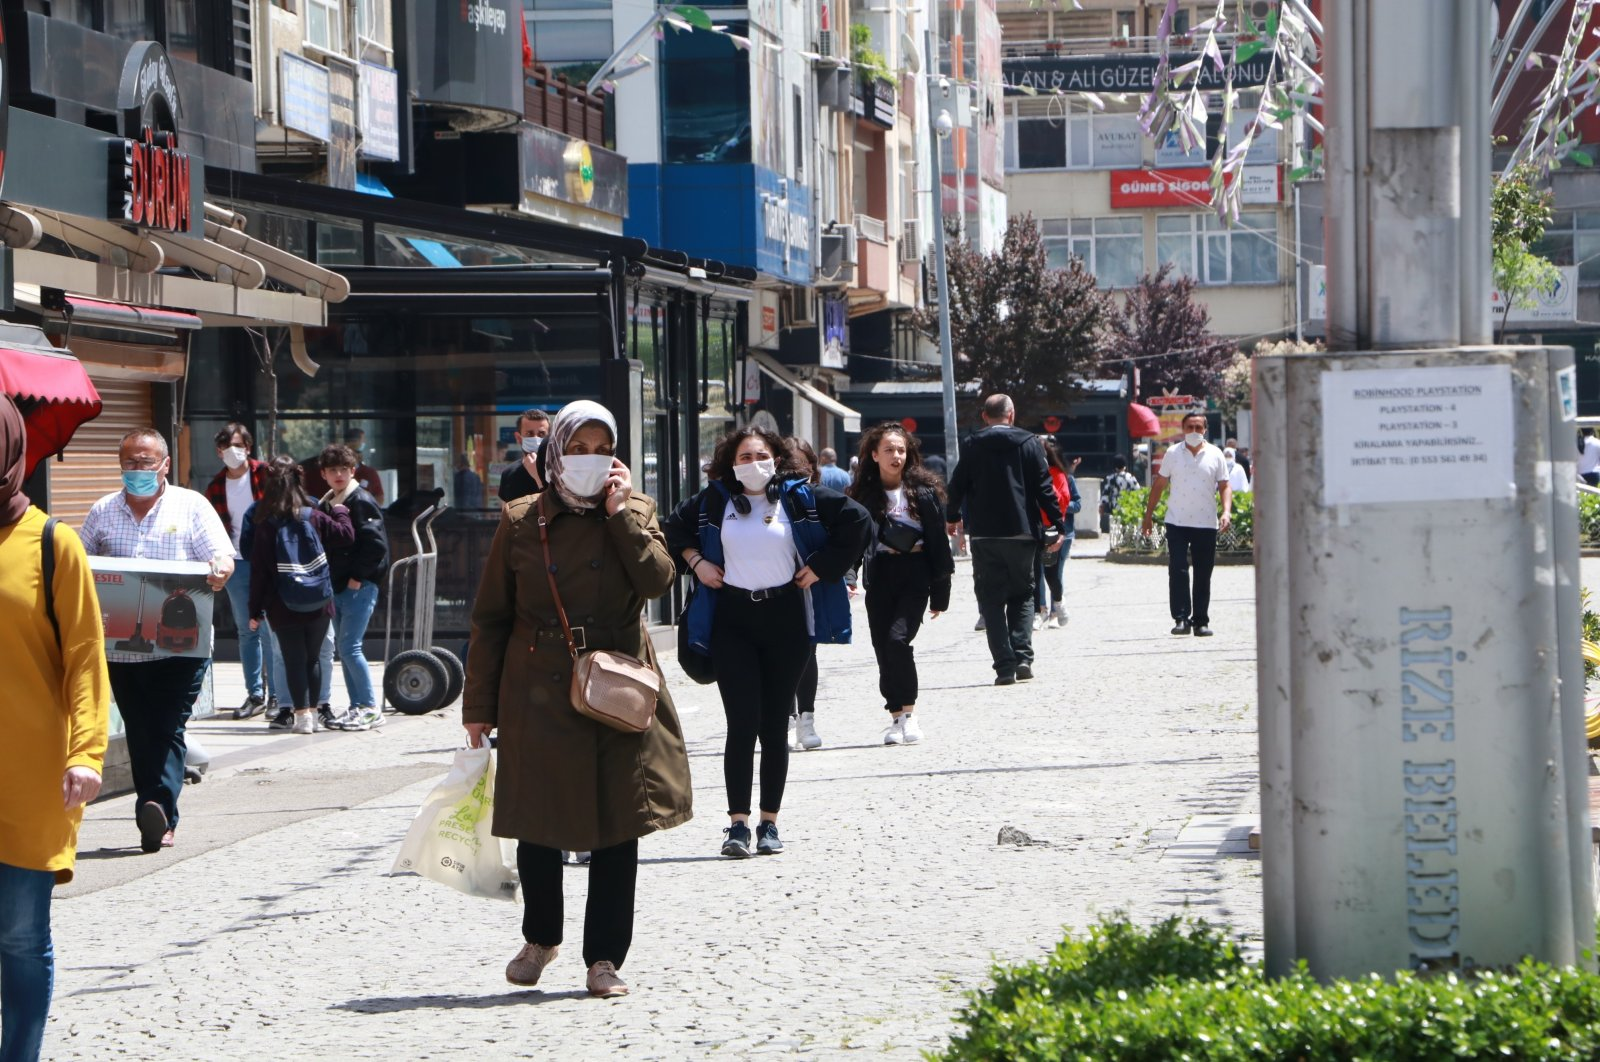 People walking on a street in Turkey's northern province Rize, July 24, 2020. (IHA Photo)